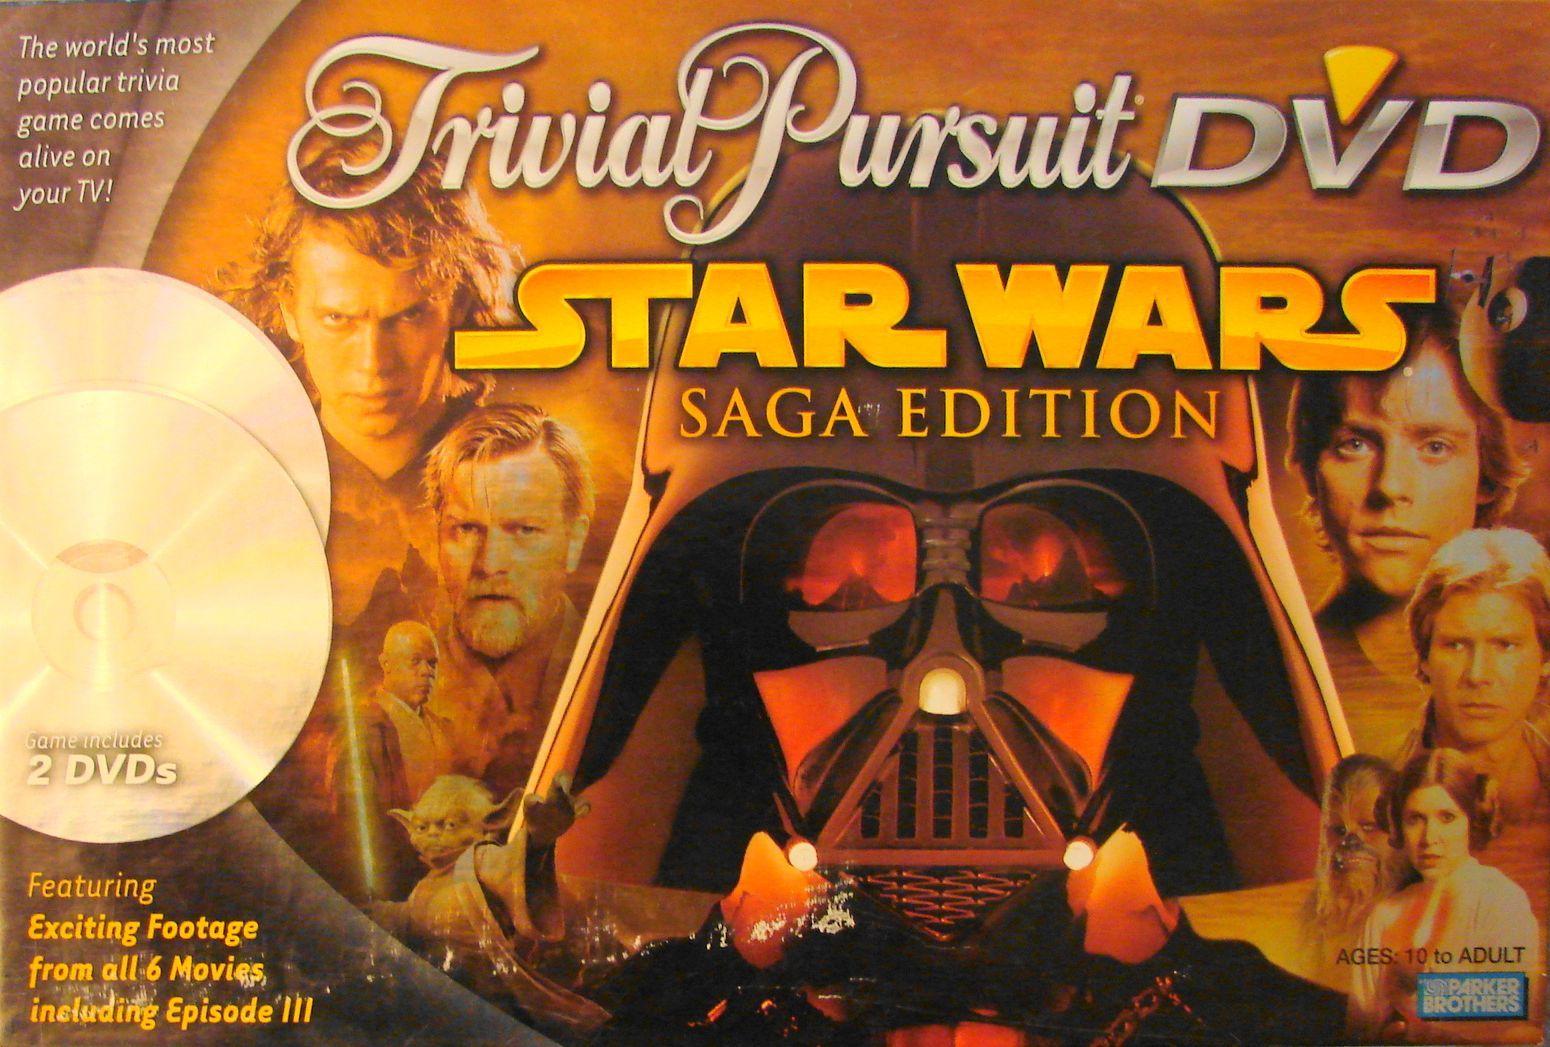 Trivial Pursuit DVD: Star Wars Saga Edition